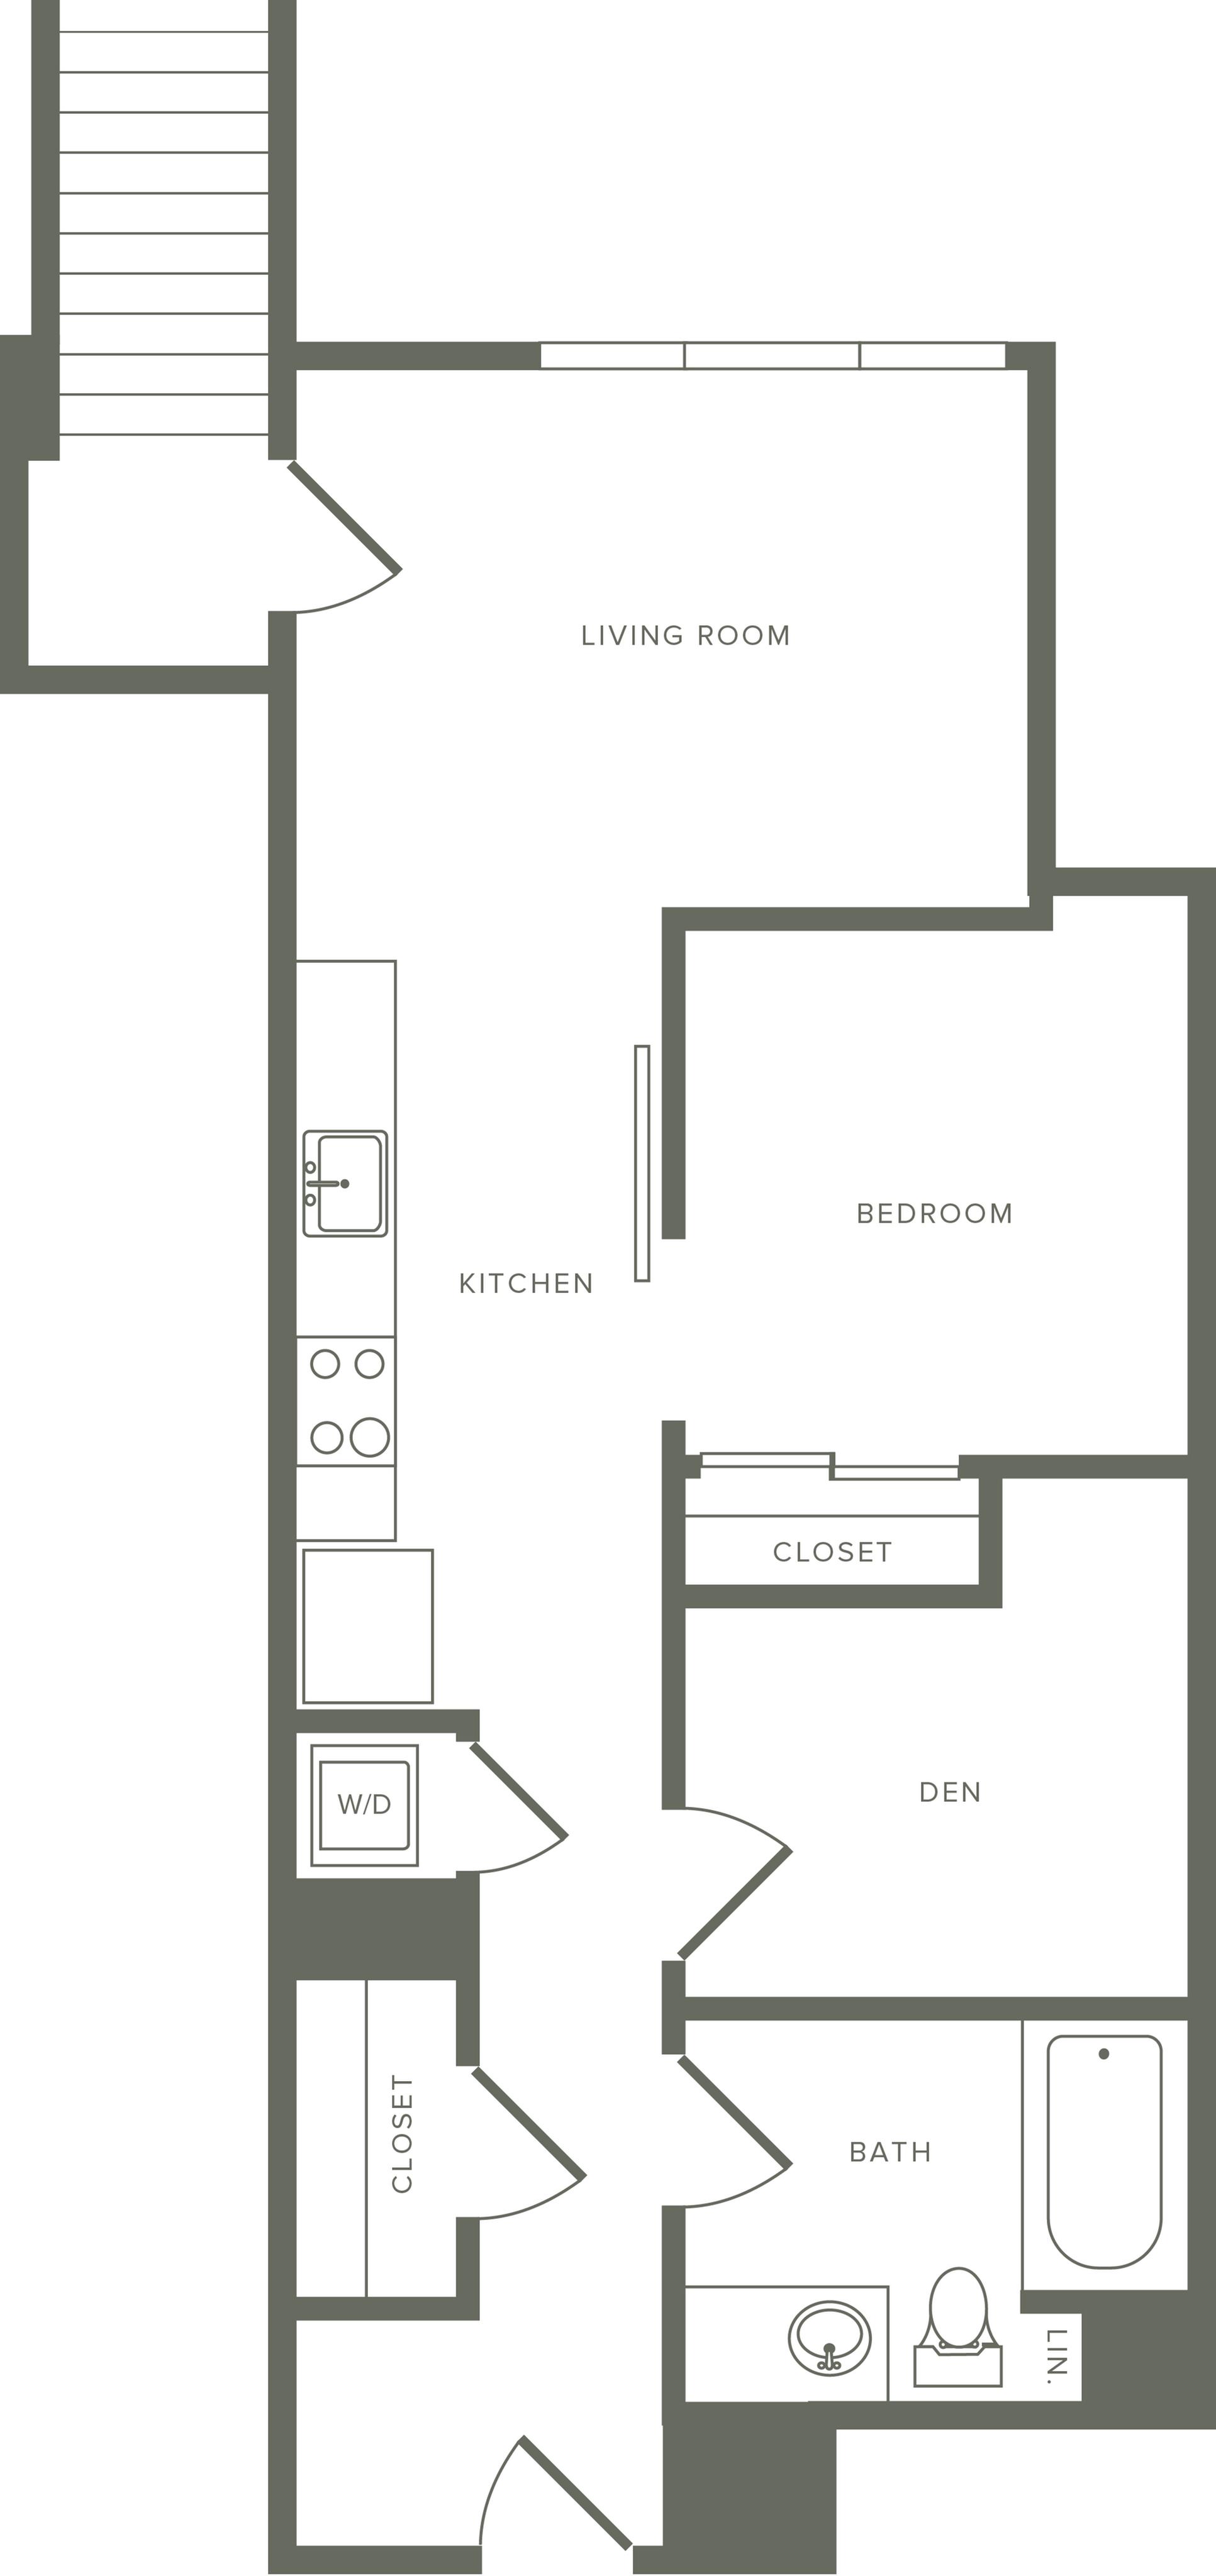 755 square foot one bedroom one bath floor plan image